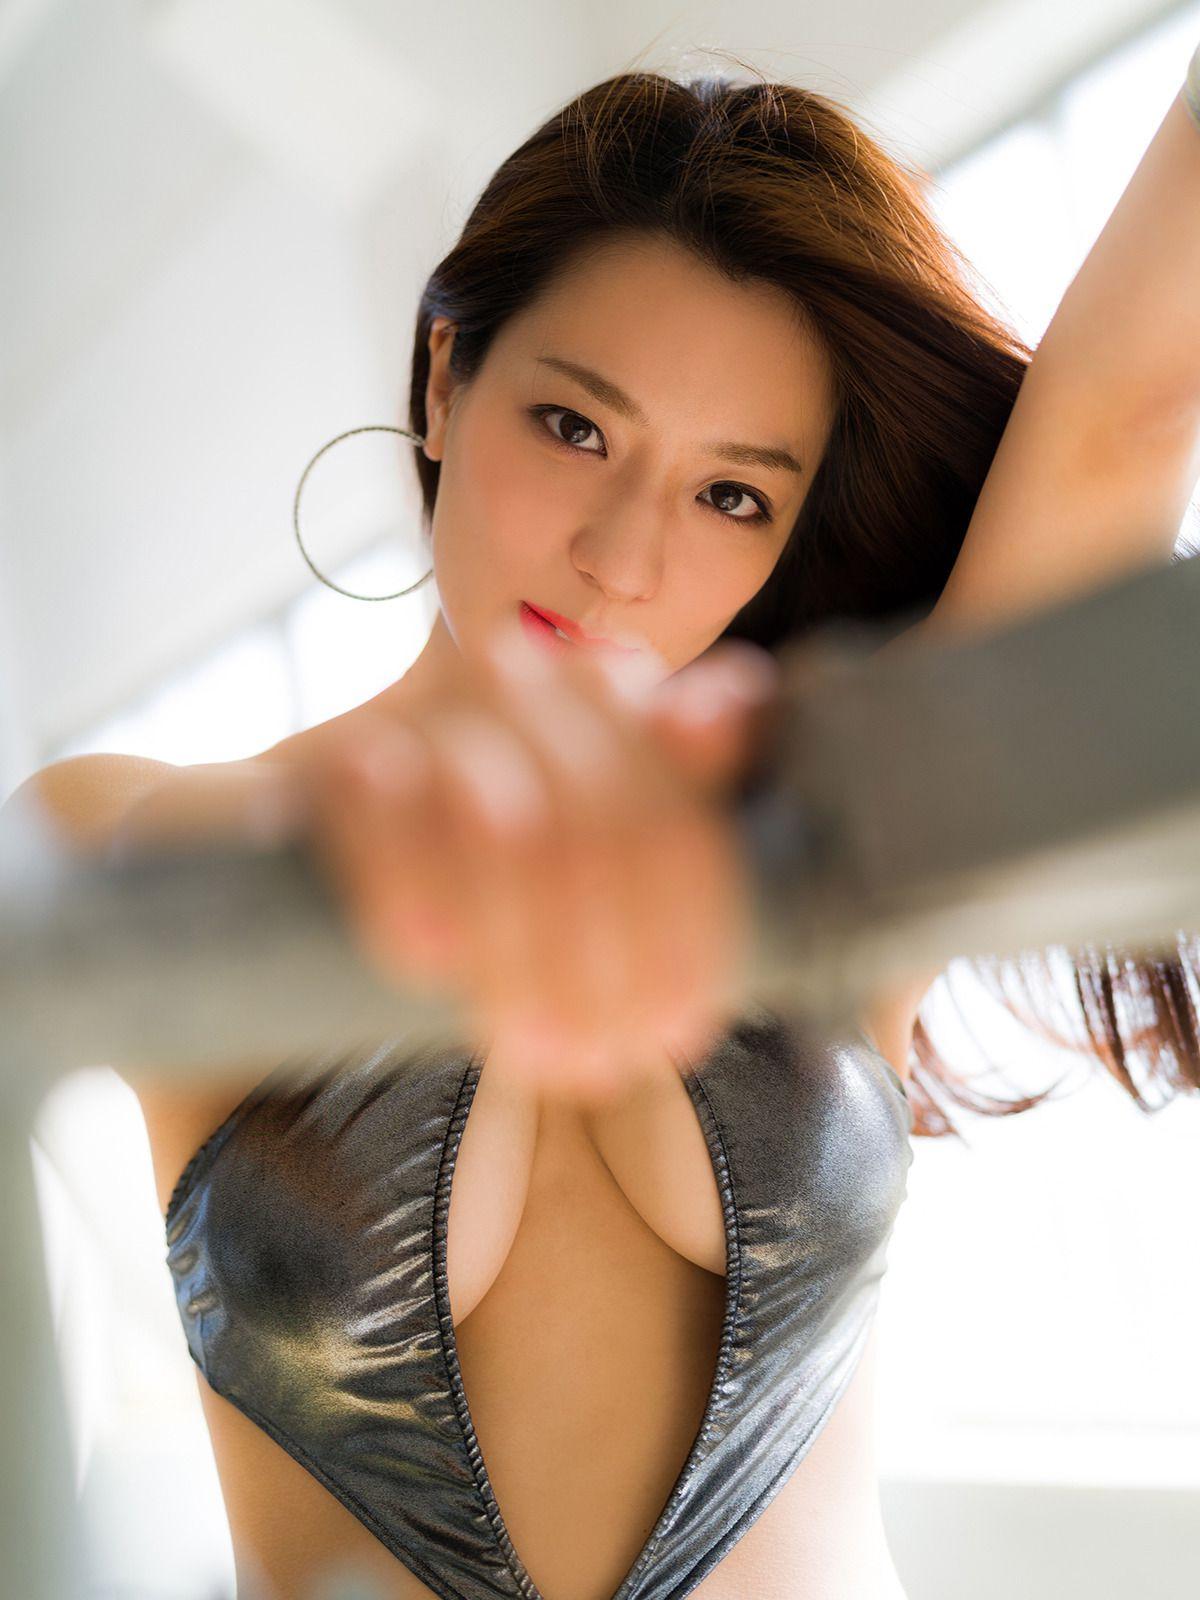 [Sabra.net] Cover Girl 小瀬田麻由『MAYU ザ・モンスター』写真套图